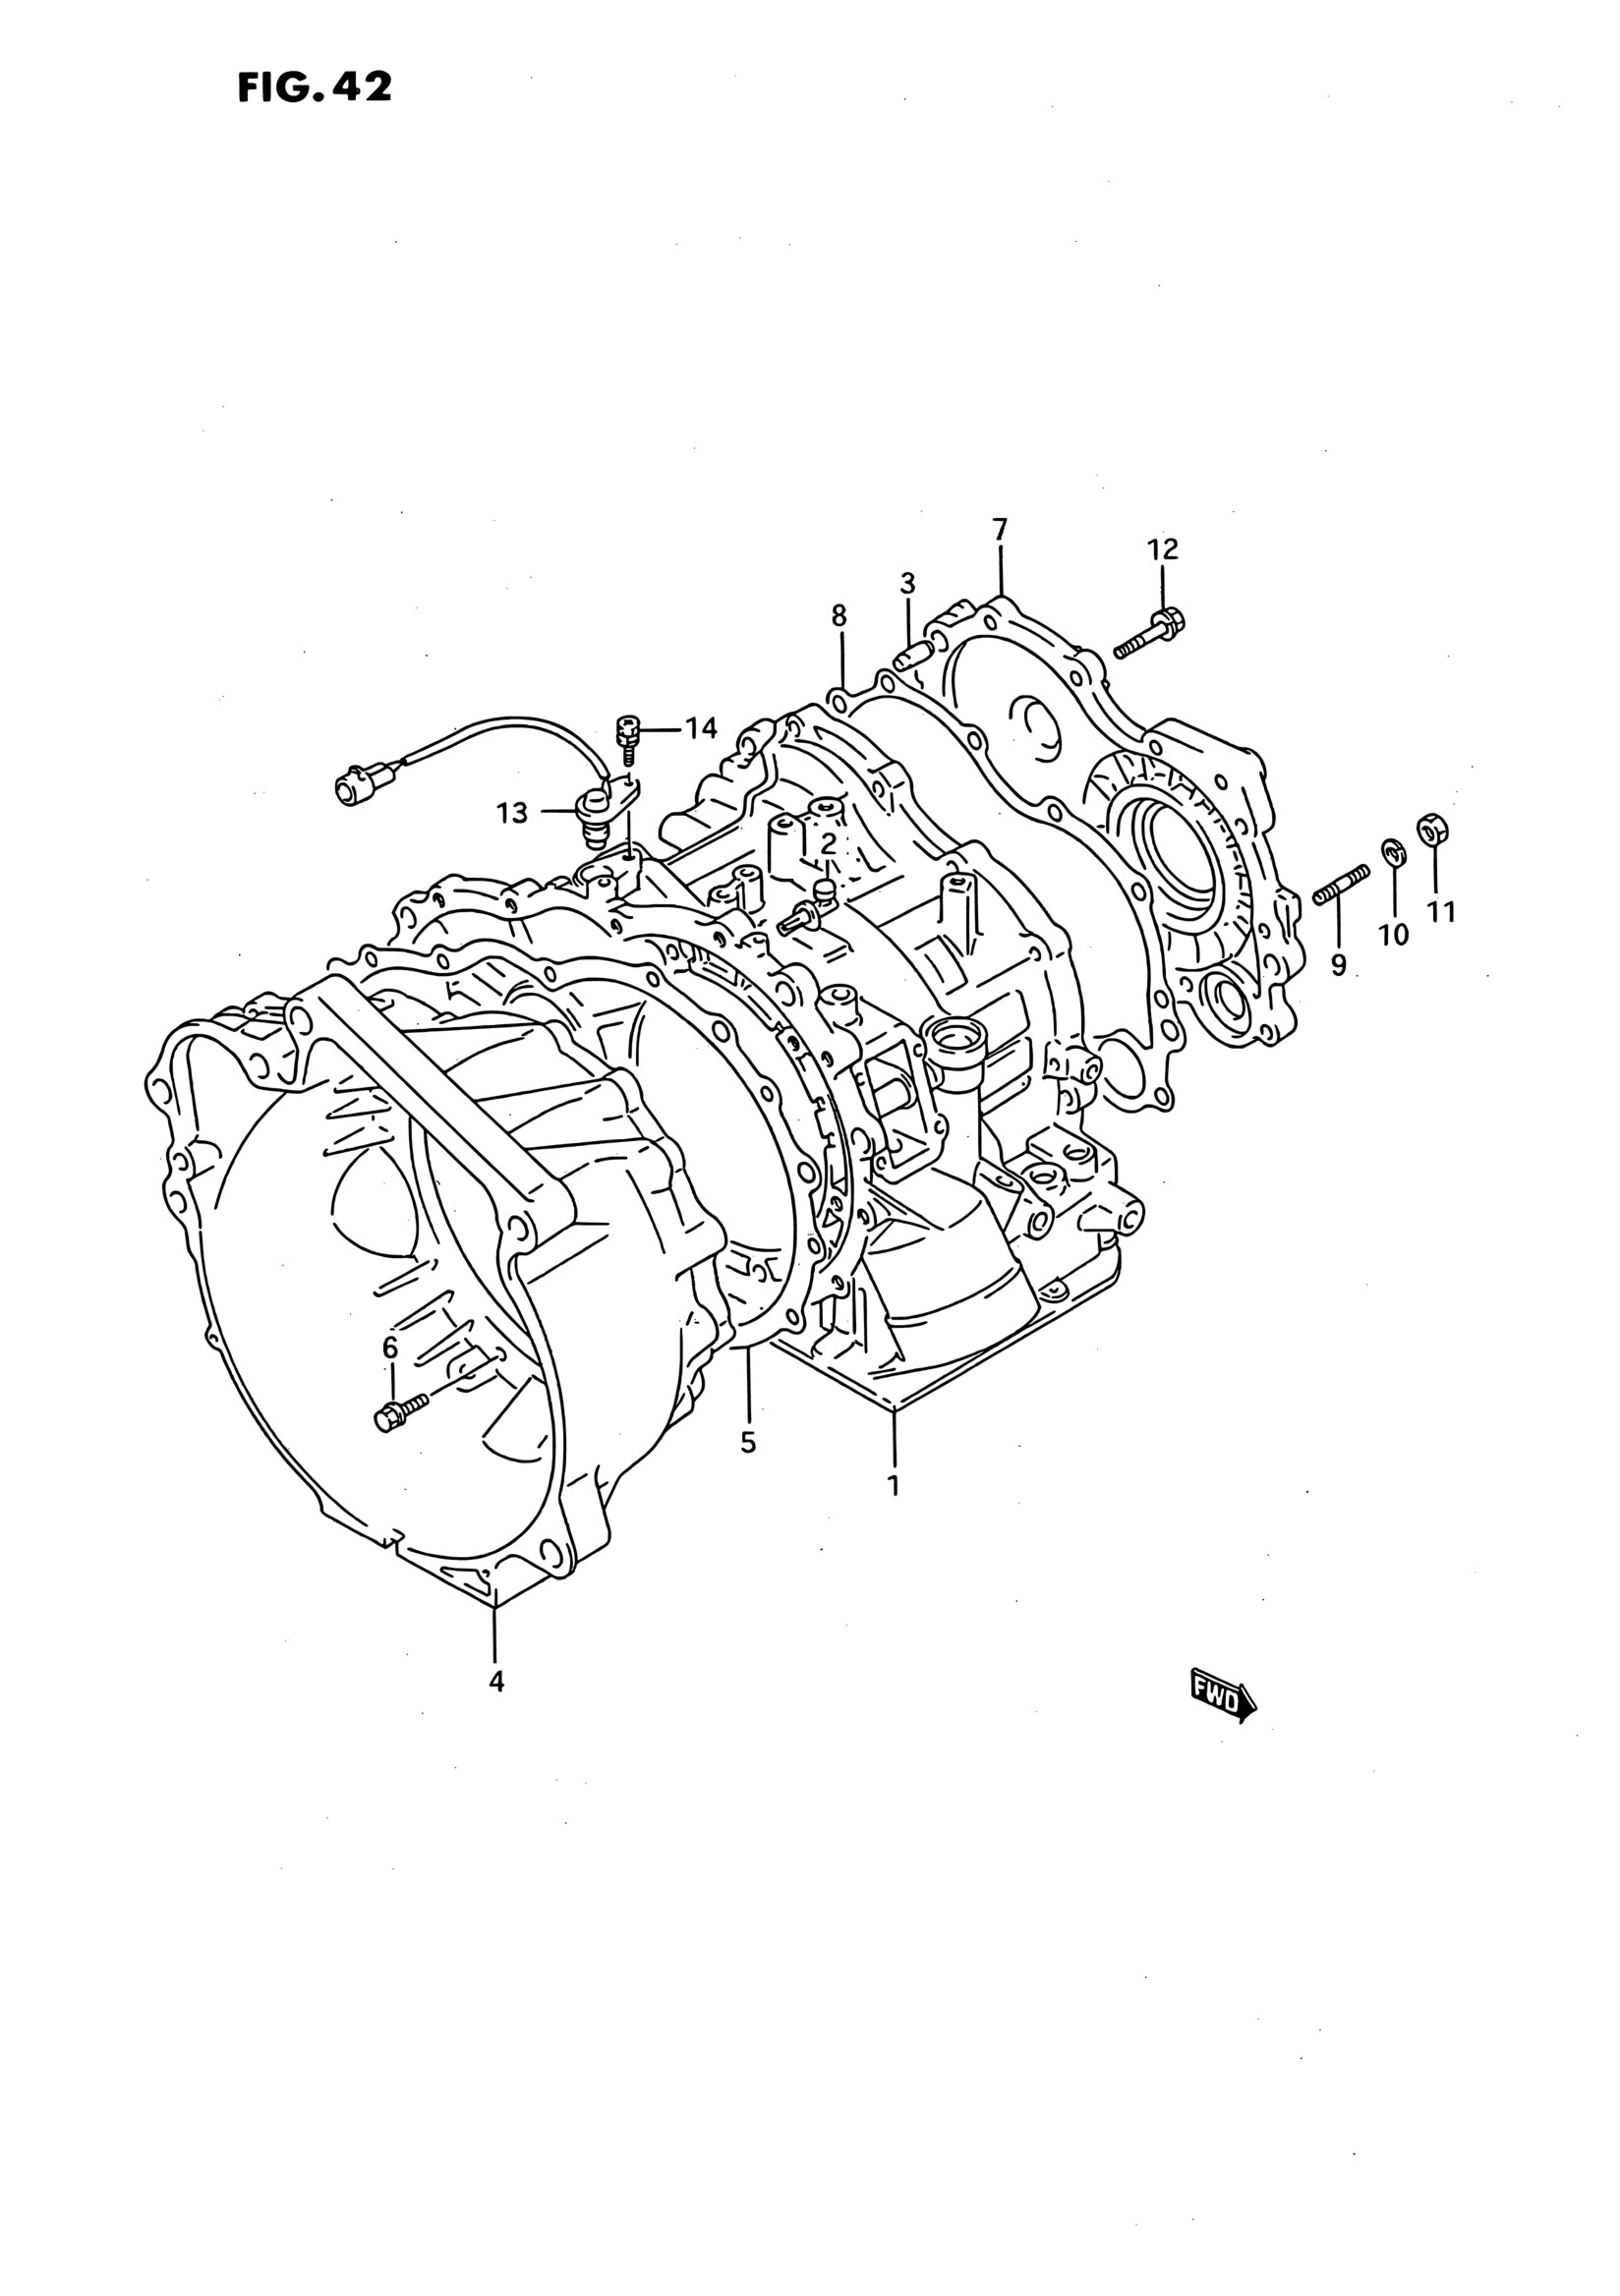 Car Parts Diagram With Names Car Parts Diagram Interior Car Parts